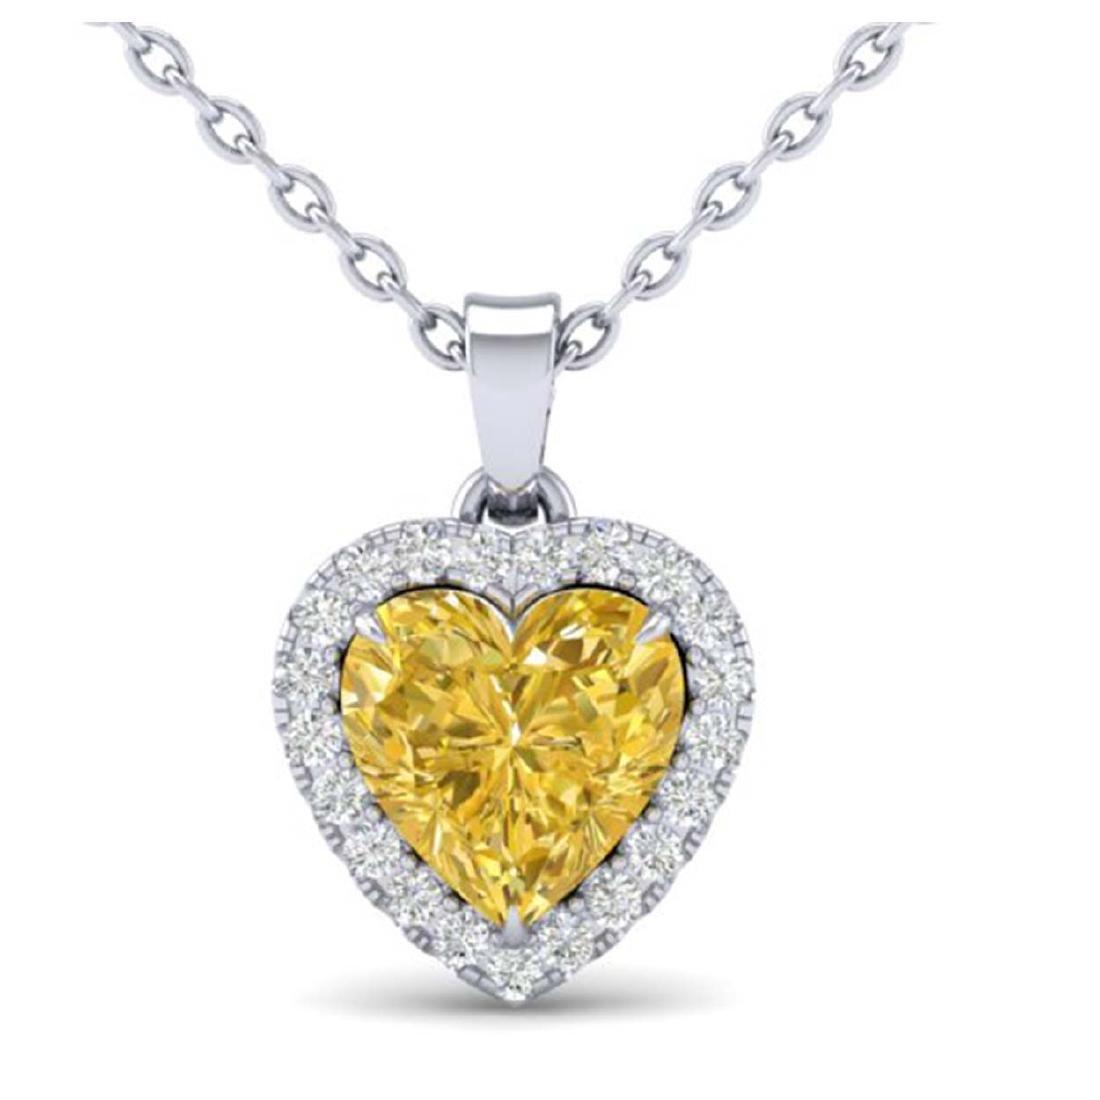 1 CTW Genuine Citrine & SI1-SI2 Diamond Heart Necklace